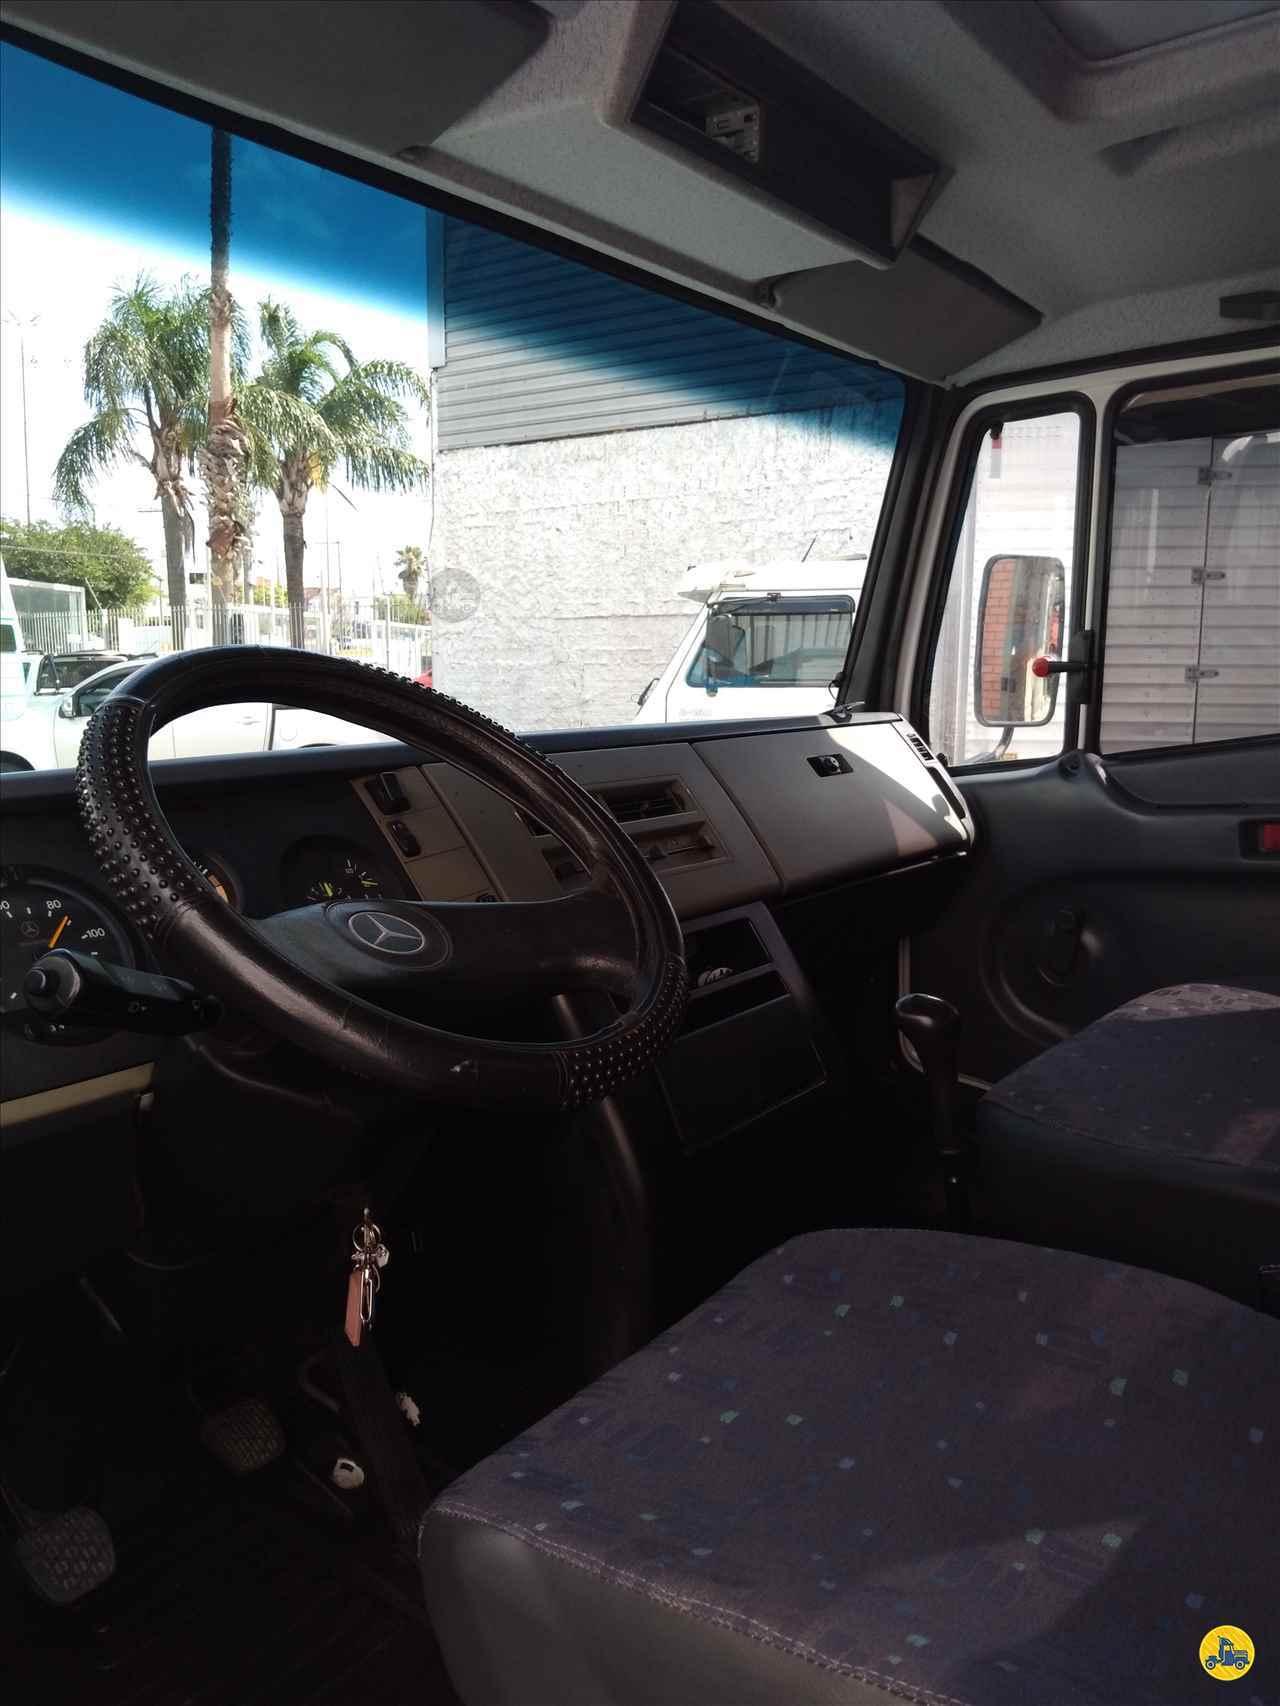 MERCEDES-BENZ MB 710 340000km 2010/2010 Adilson Caminhões